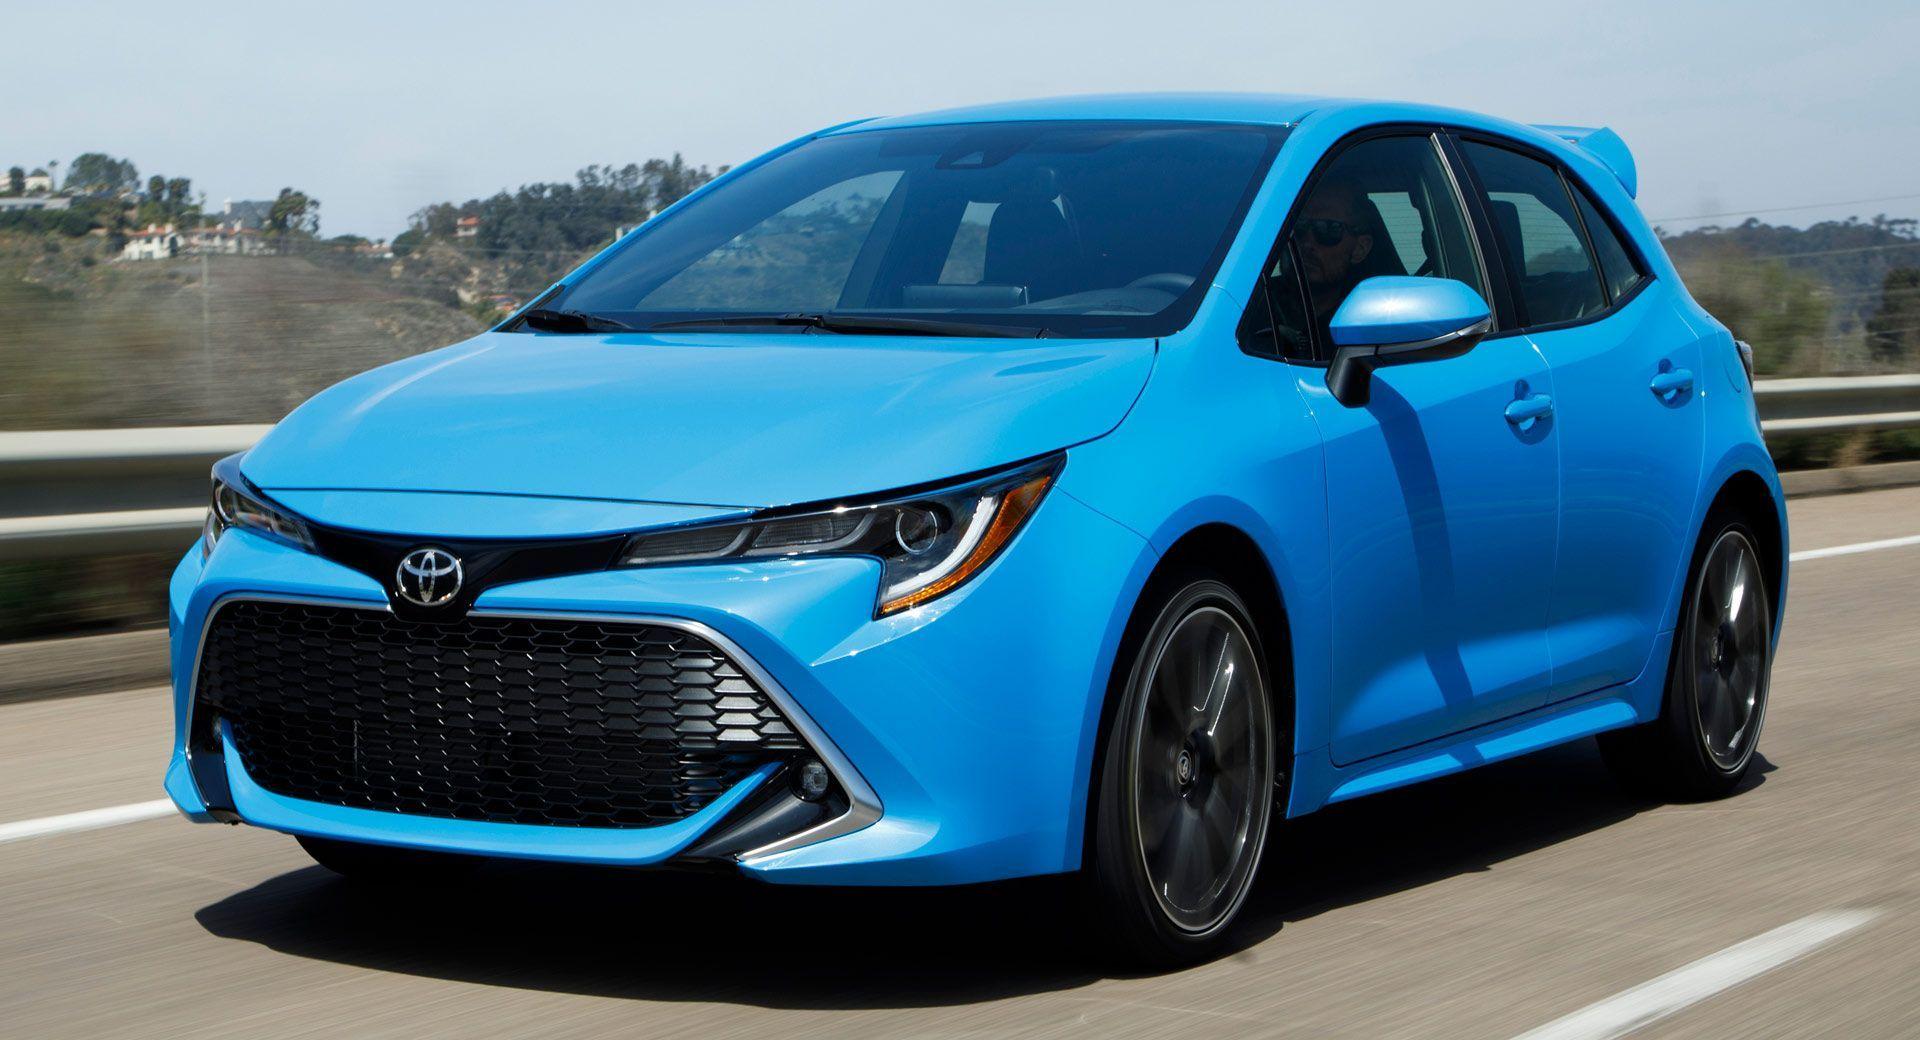 2019 Toyota Corolla Hatchback Starts Just Under 20k Toyota Corolla Hatchback Corolla Hatchback Corolla Car